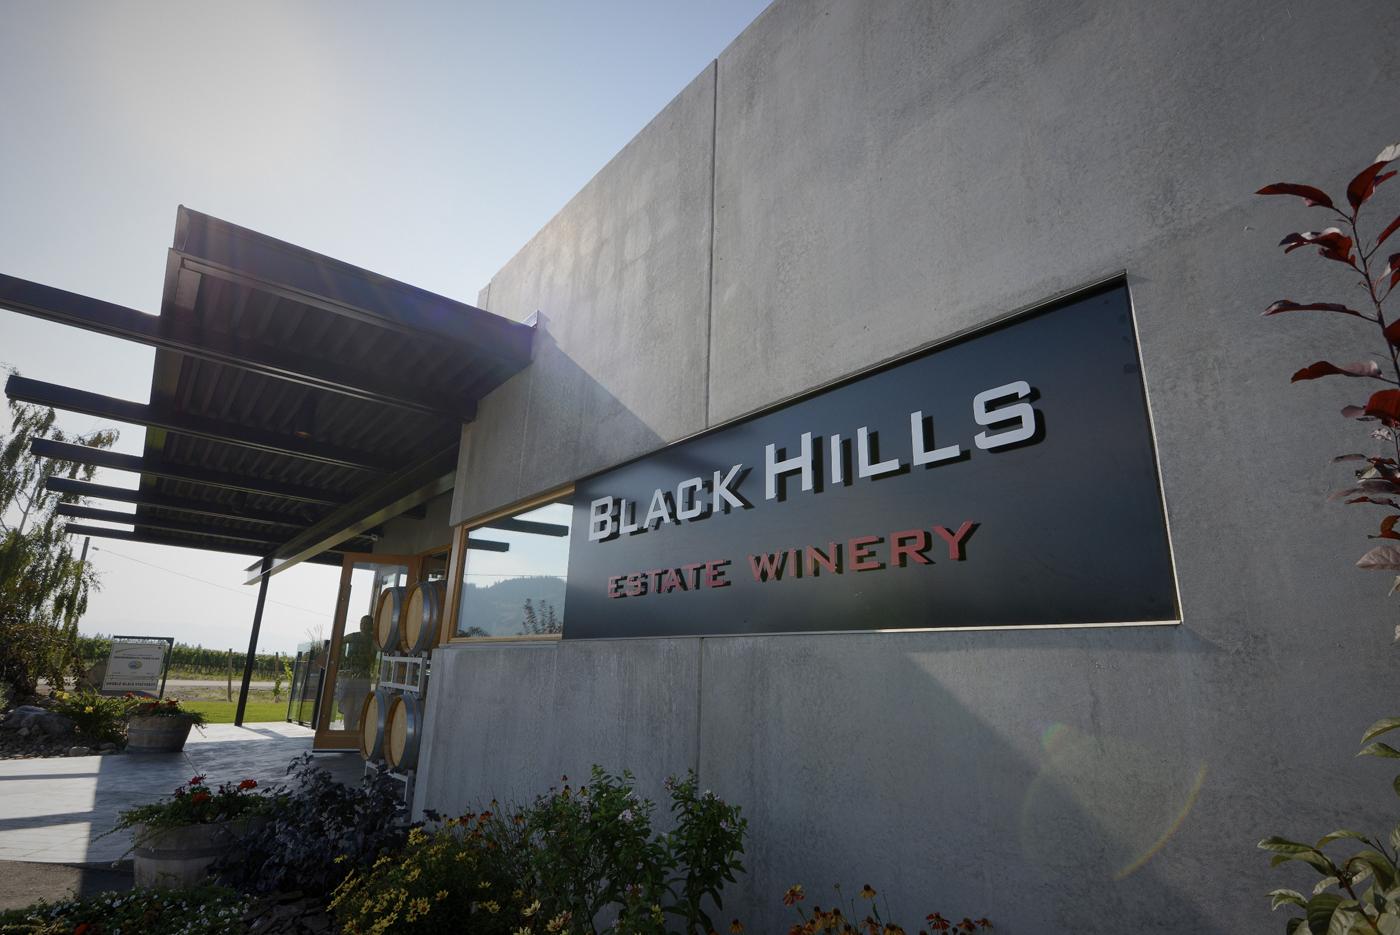 Black Hills Estate Winery, Okanagan, BC